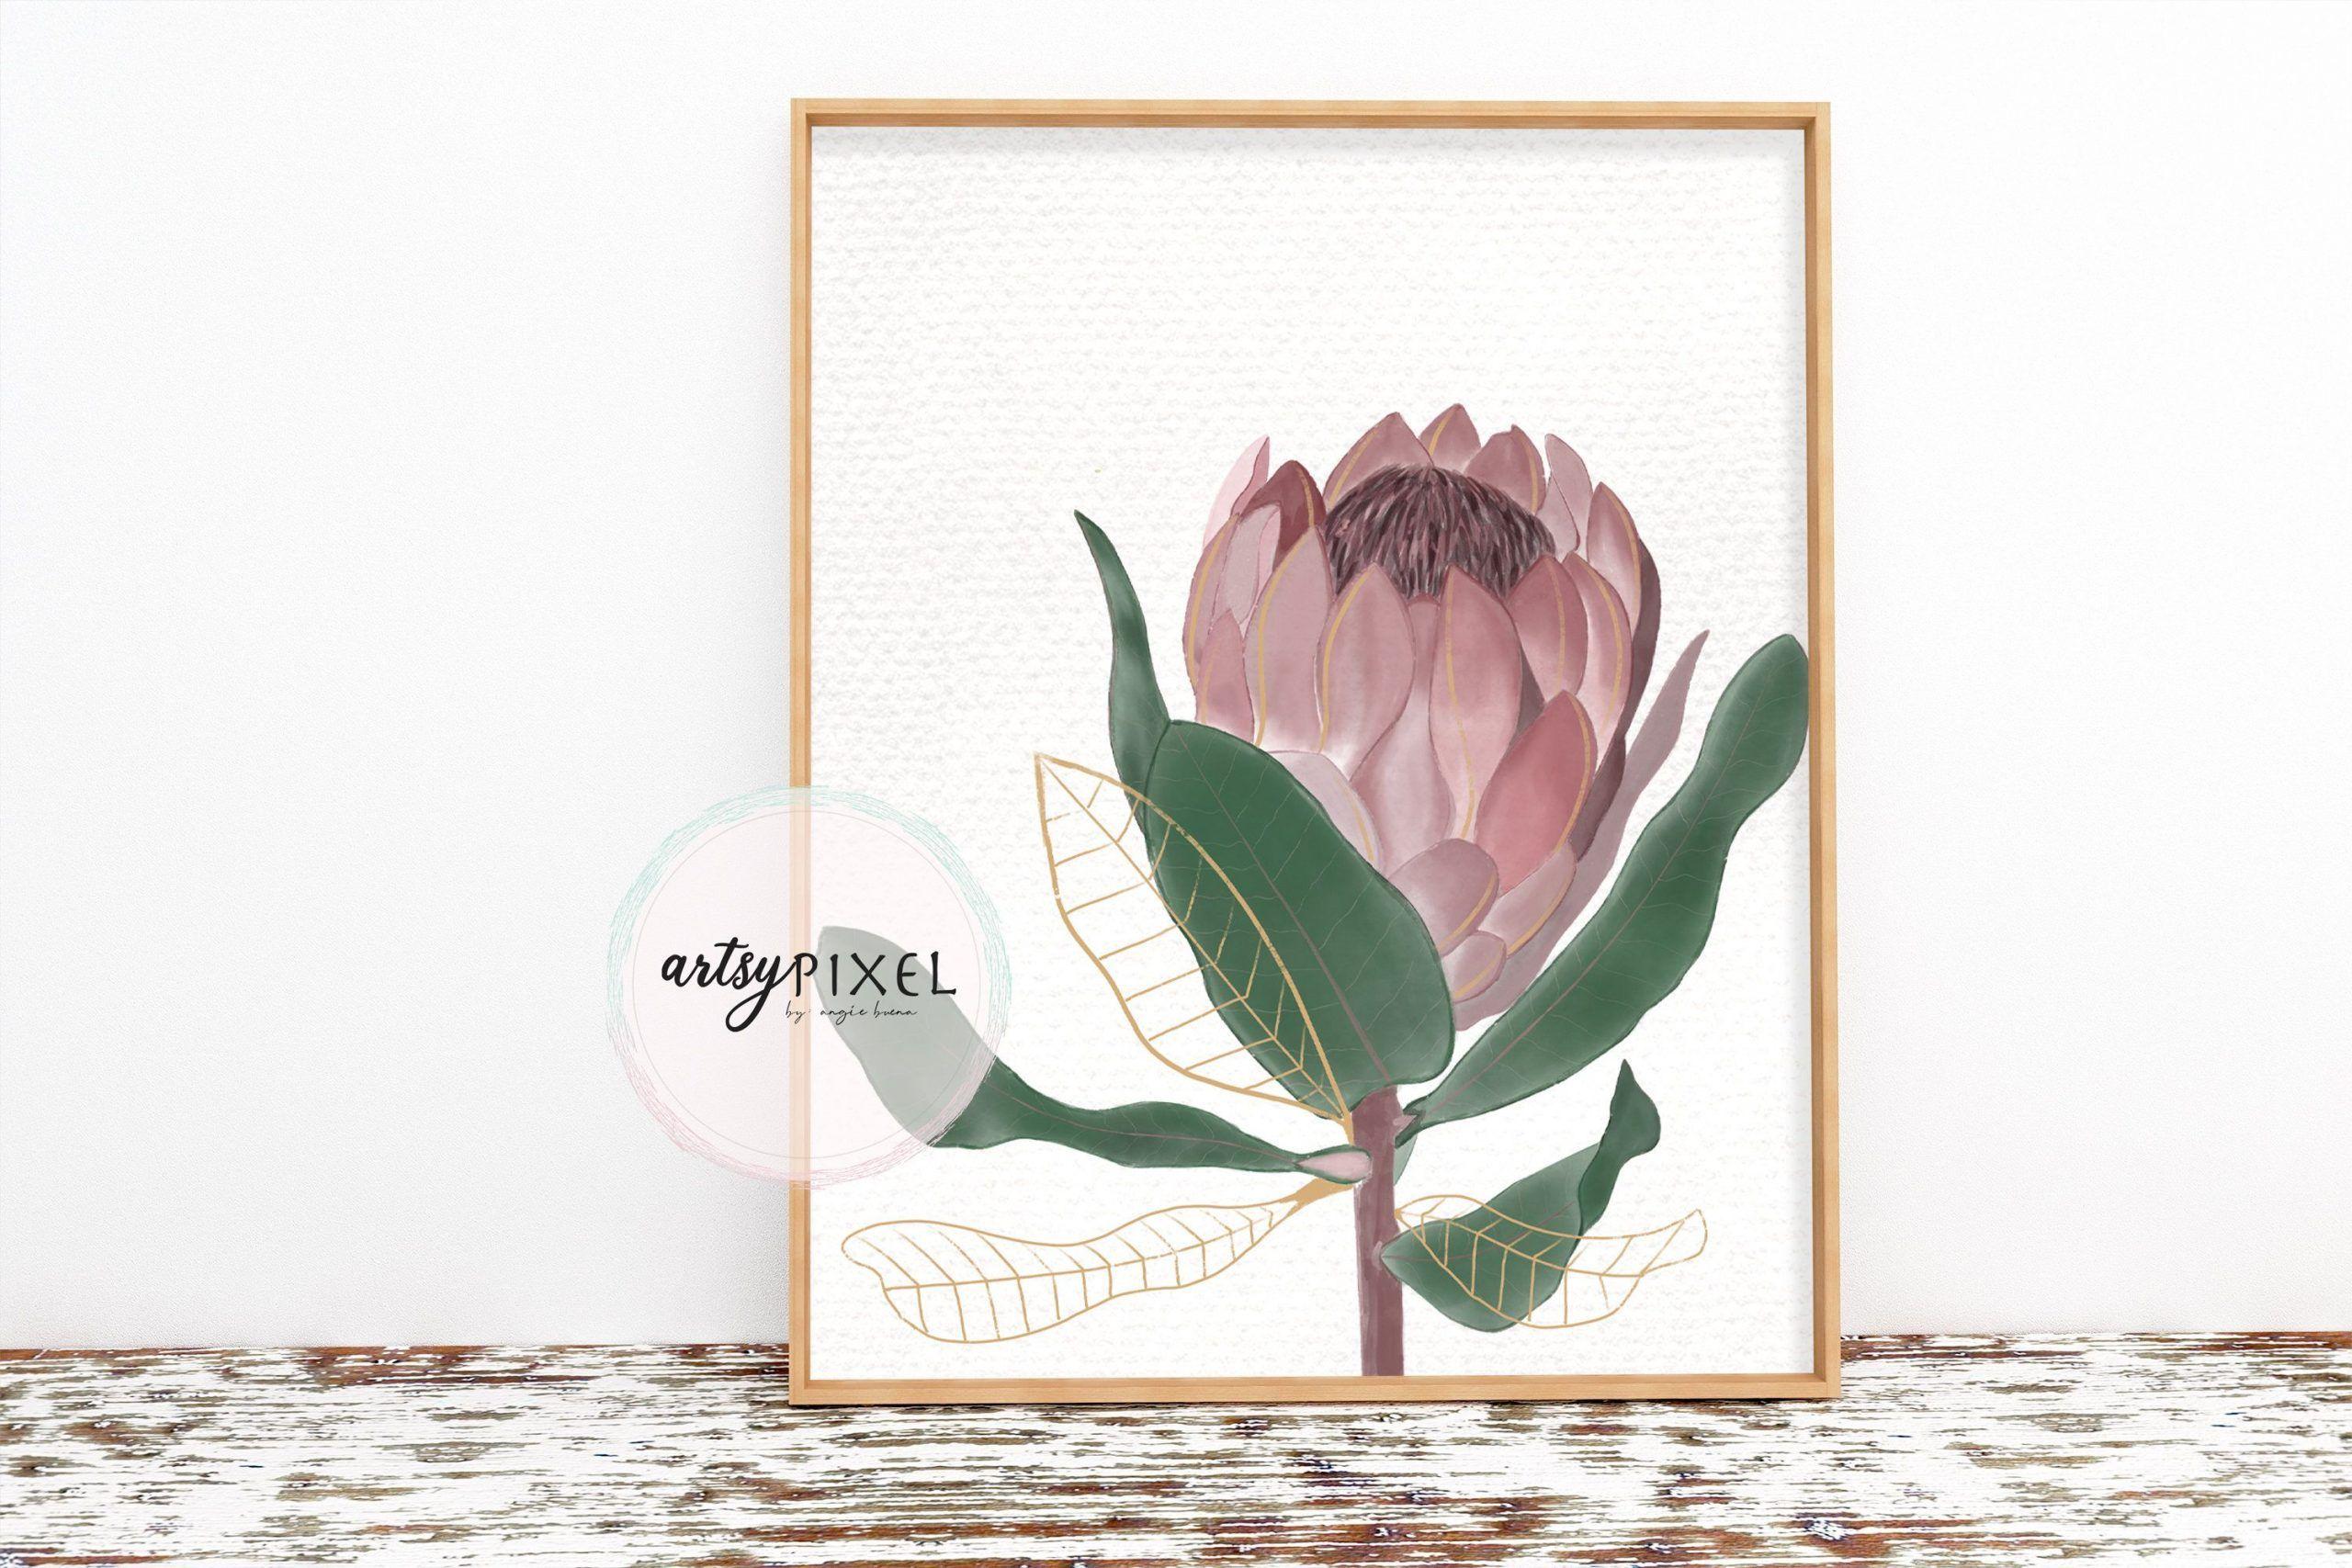 Protea flower digital print 01, digital download, instant download printable#dig...#digital #download #flower #instant #print #printabledig #protea